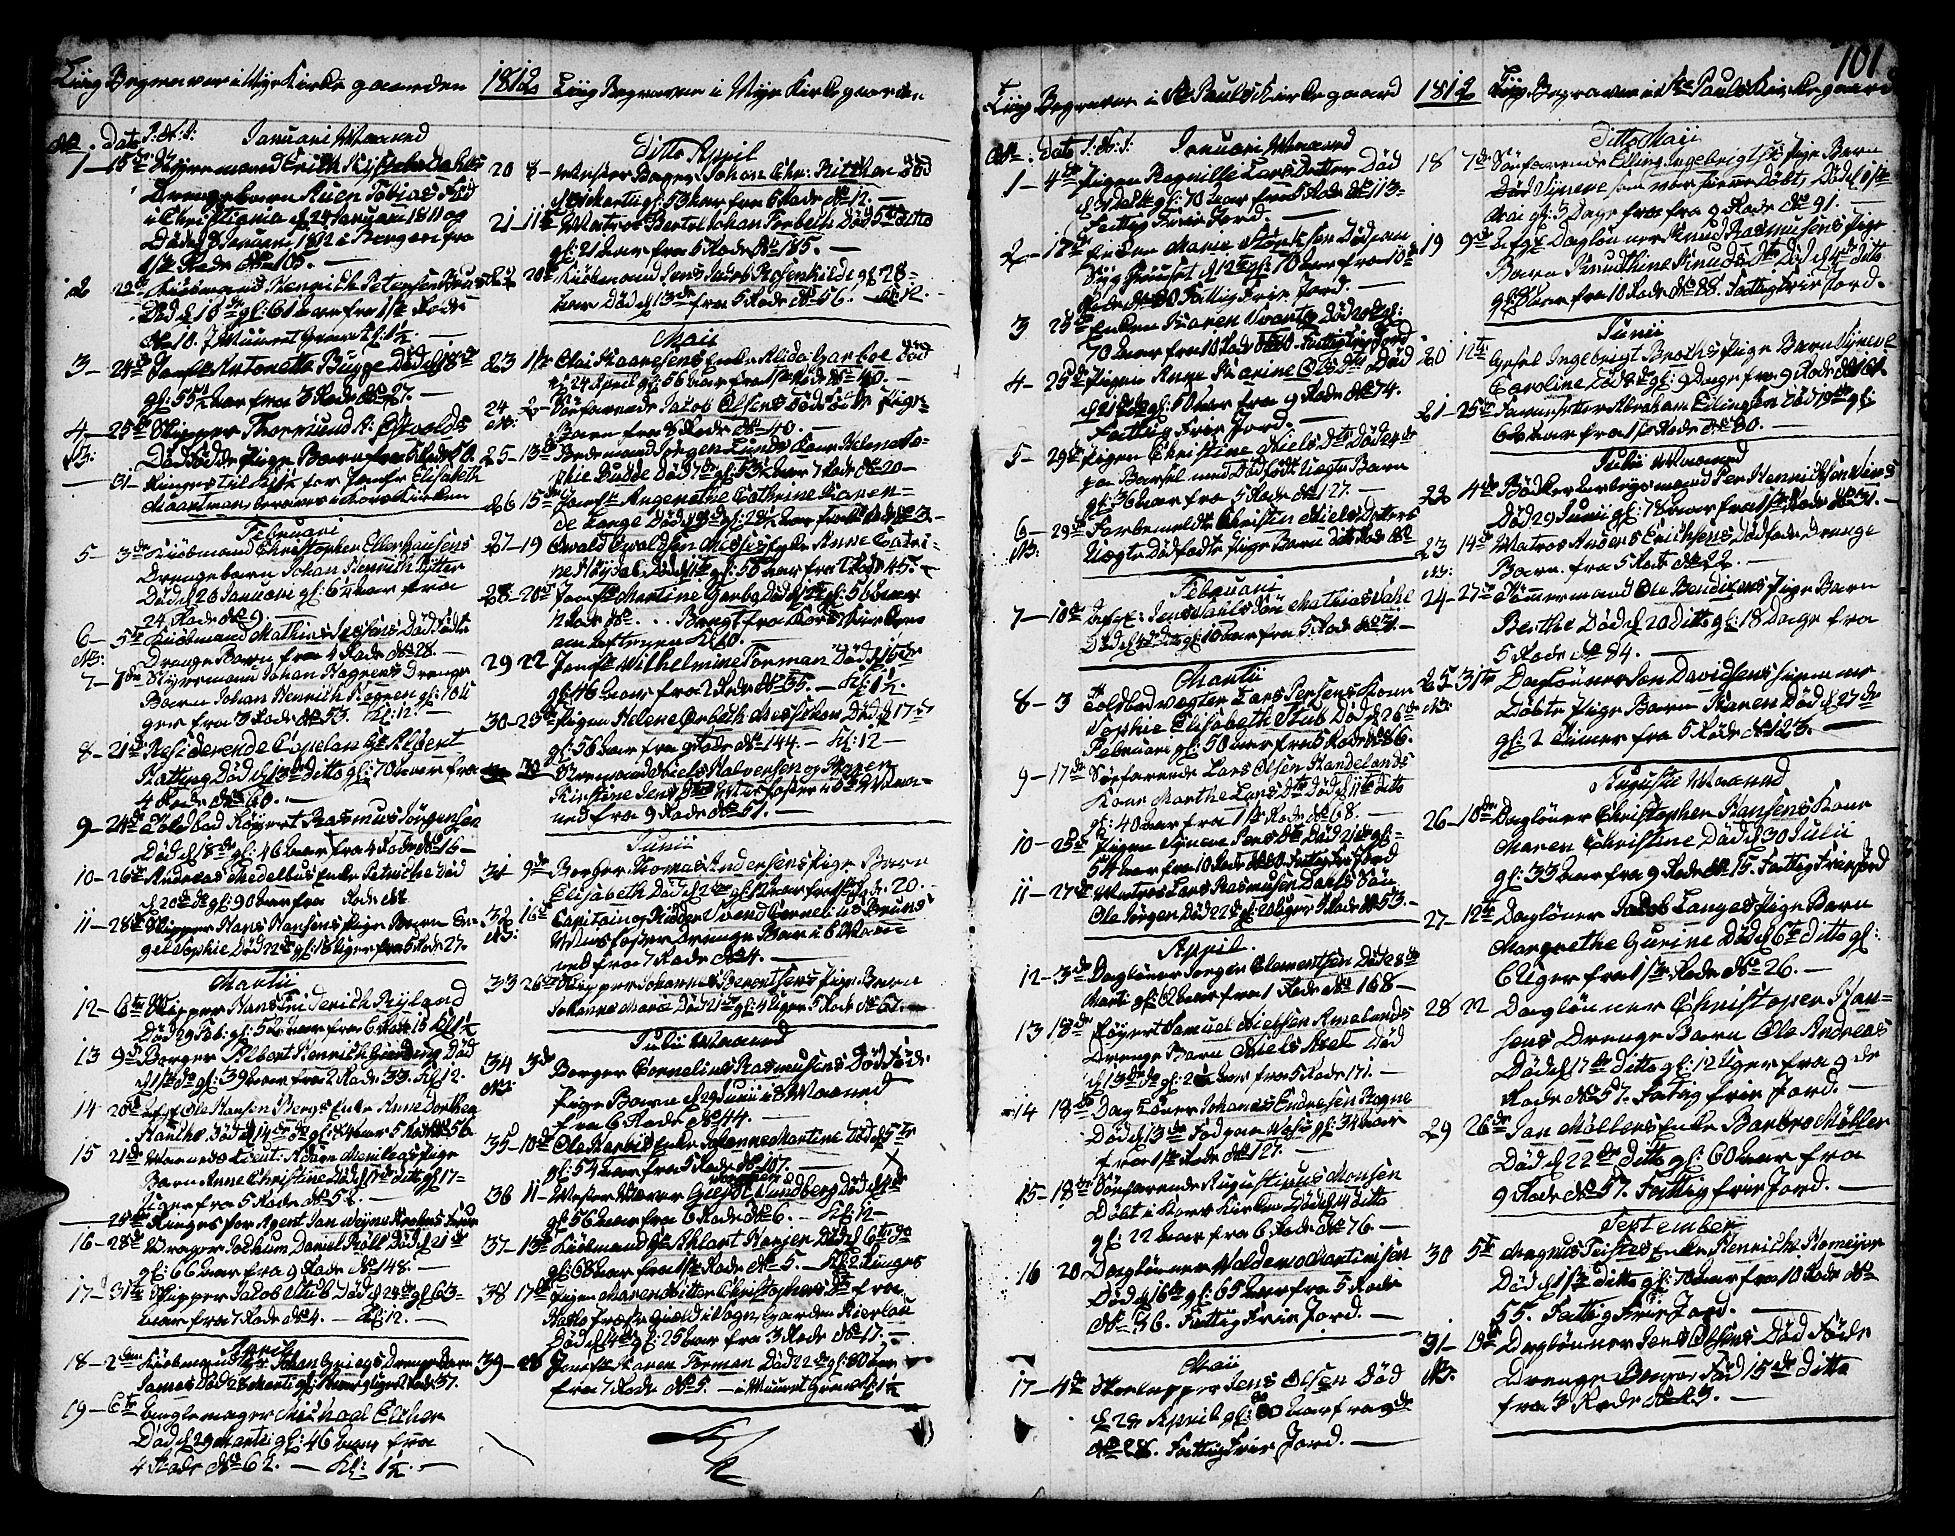 SAB, Nykirken Sokneprestembete, H/Hab: Klokkerbok nr. A 3, 1775-1820, s. 101